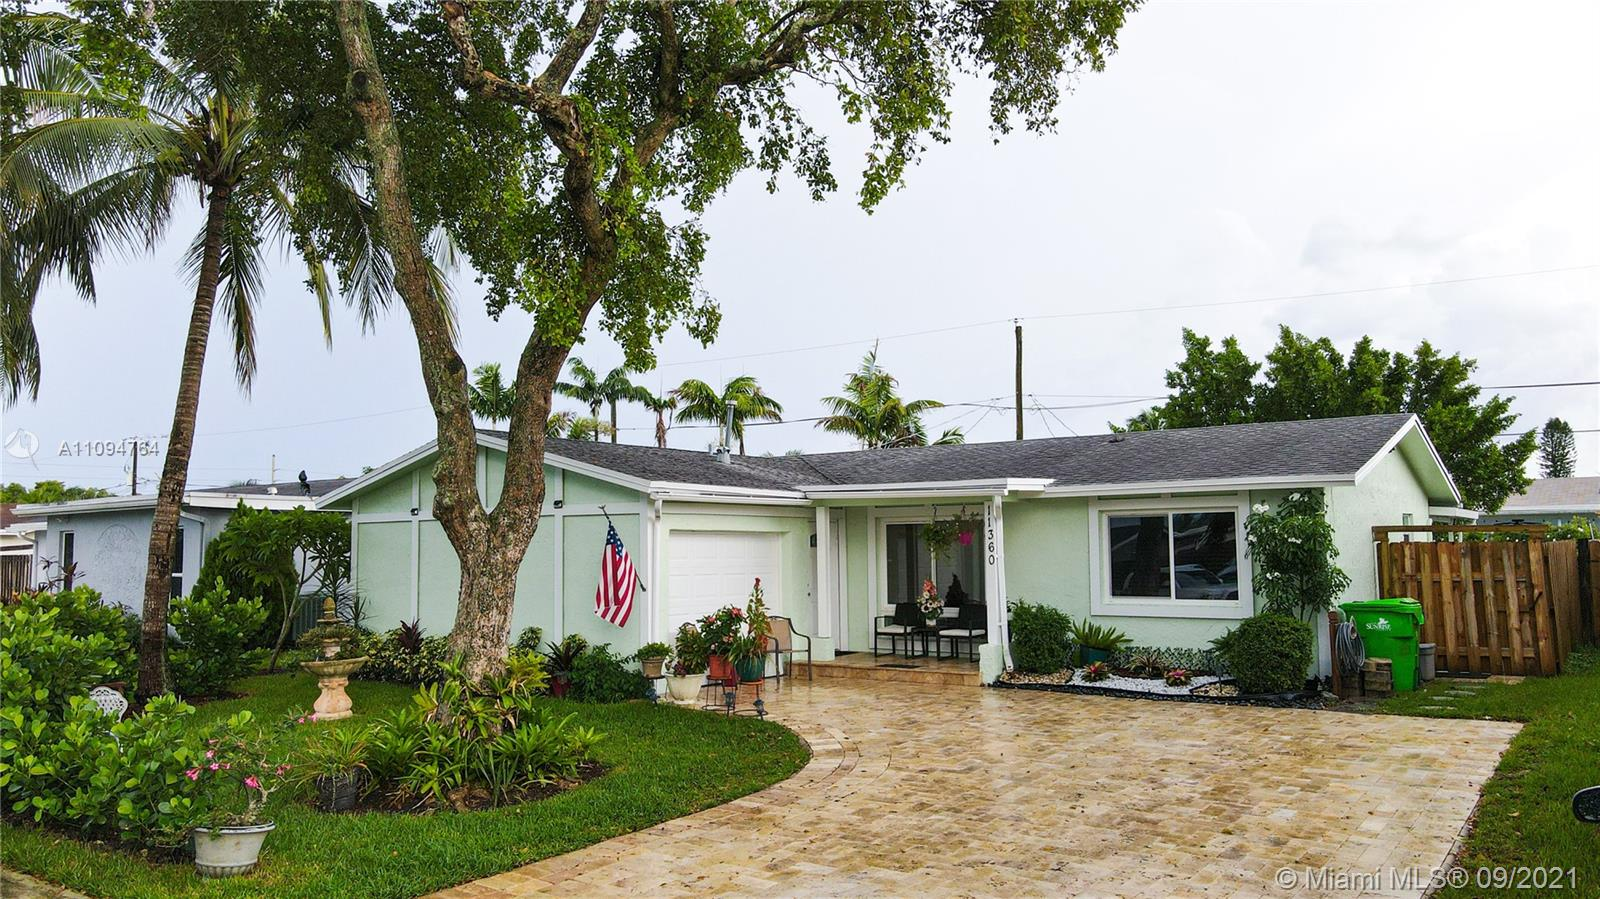 Sunrise Golf Village - 11360 NW 31st St, Sunrise, FL 33323